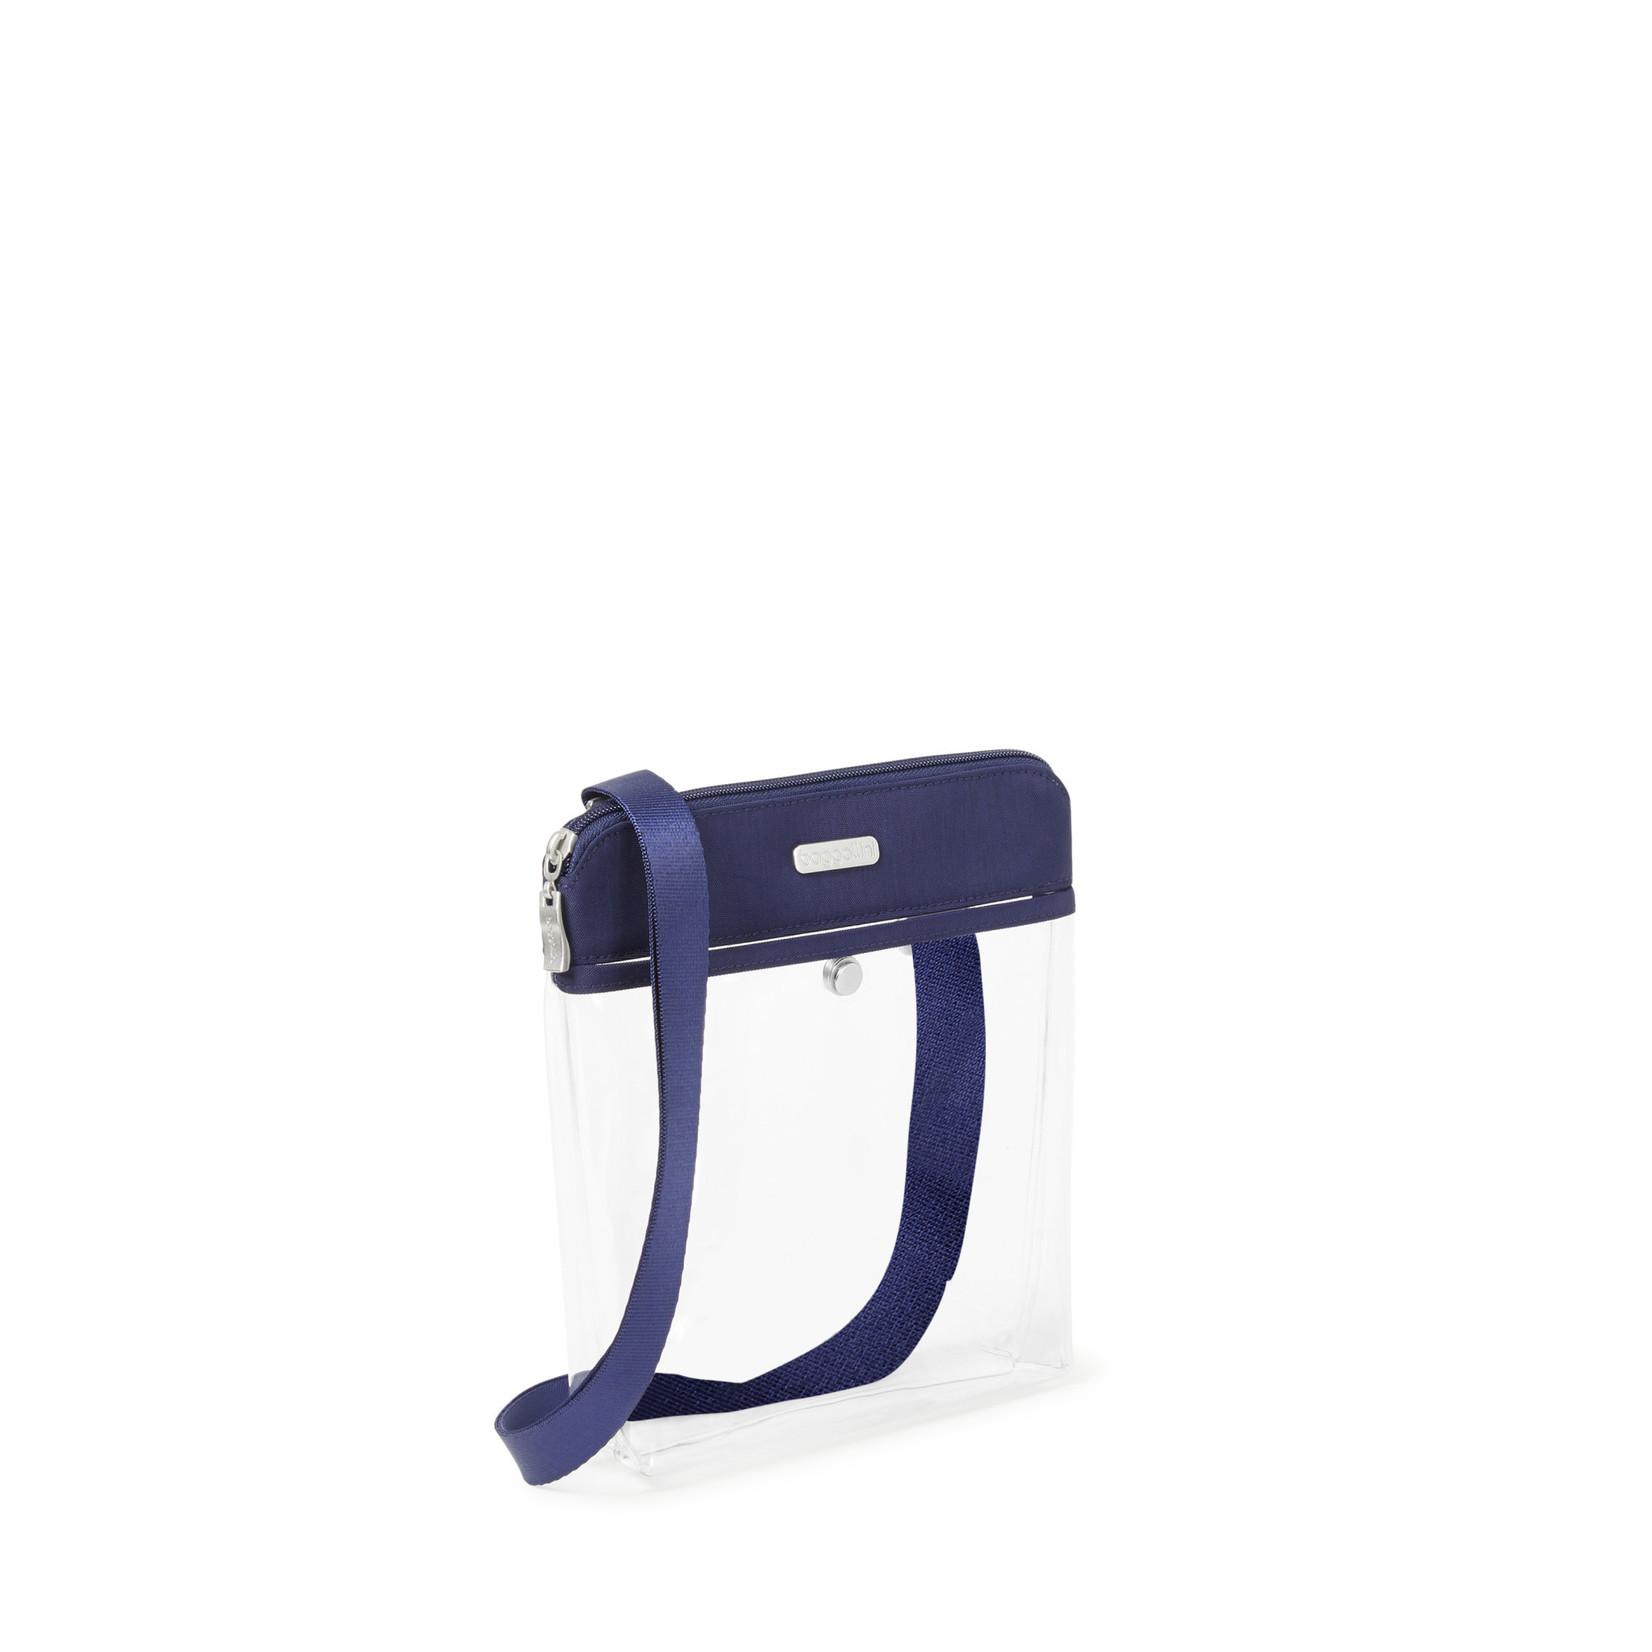 Baggallini Clear Event Compliant Pocket Crossbody - Dark Blue